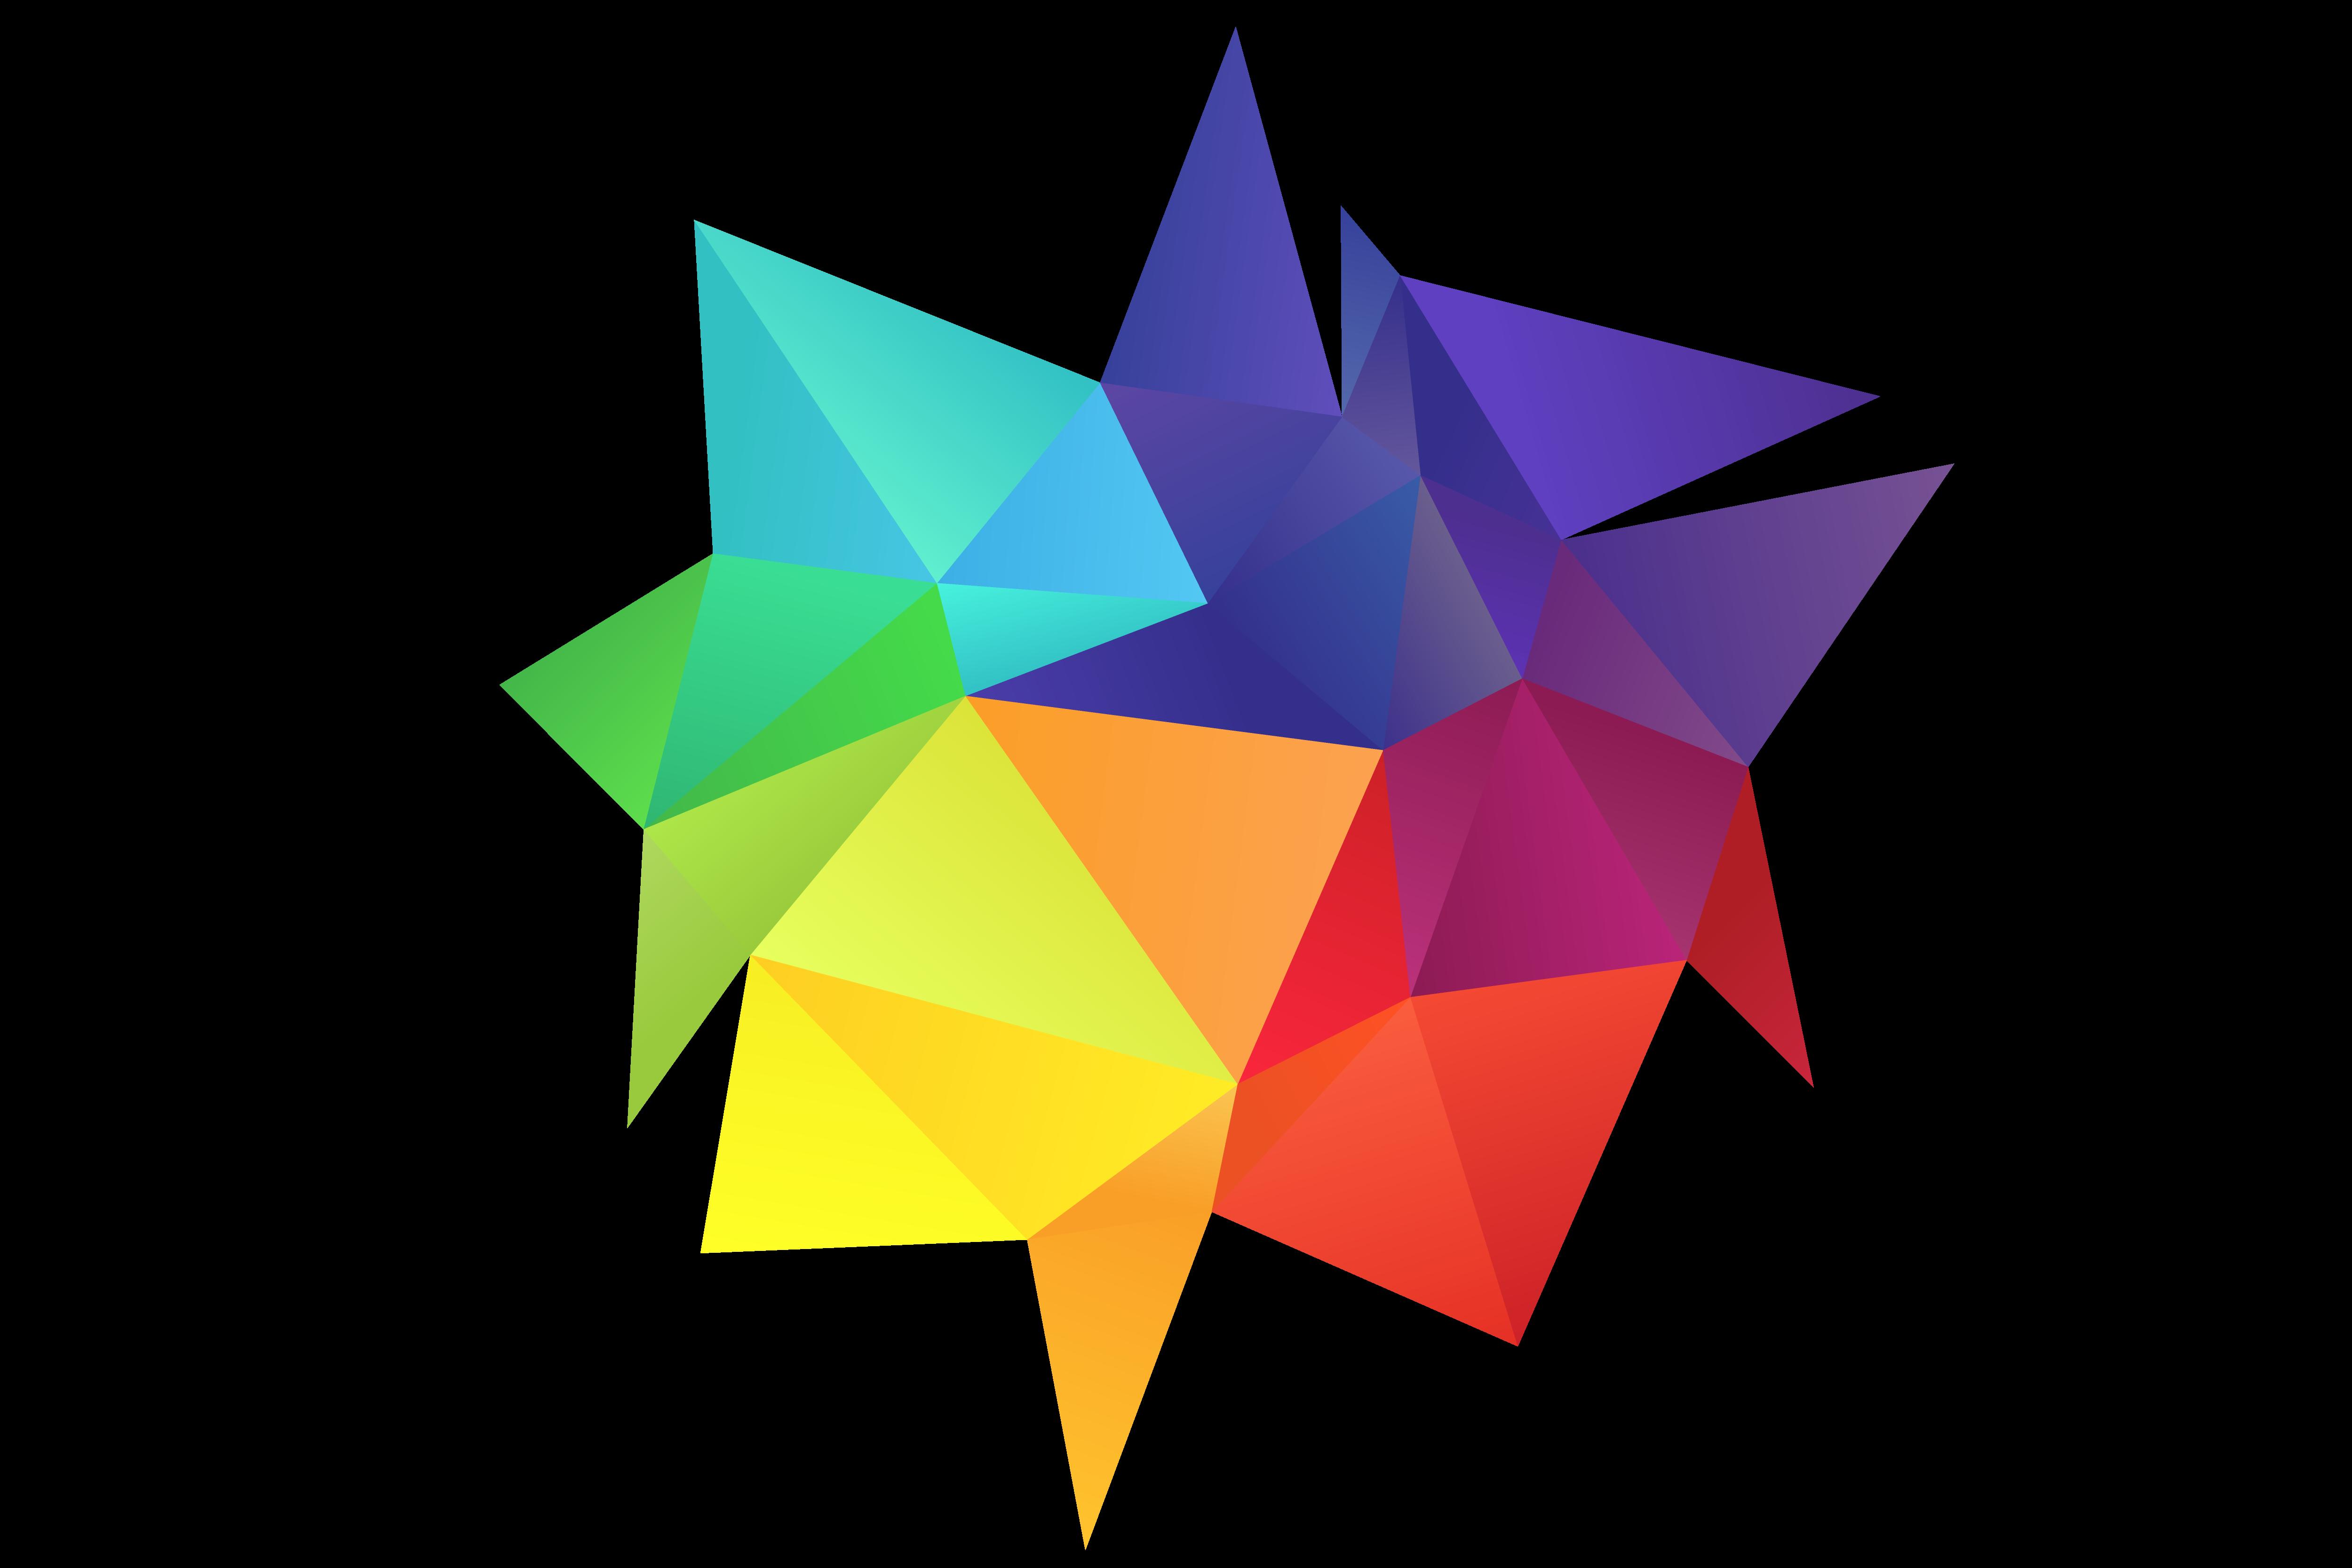 Rainbow colors element psdgraphics. Vector design png